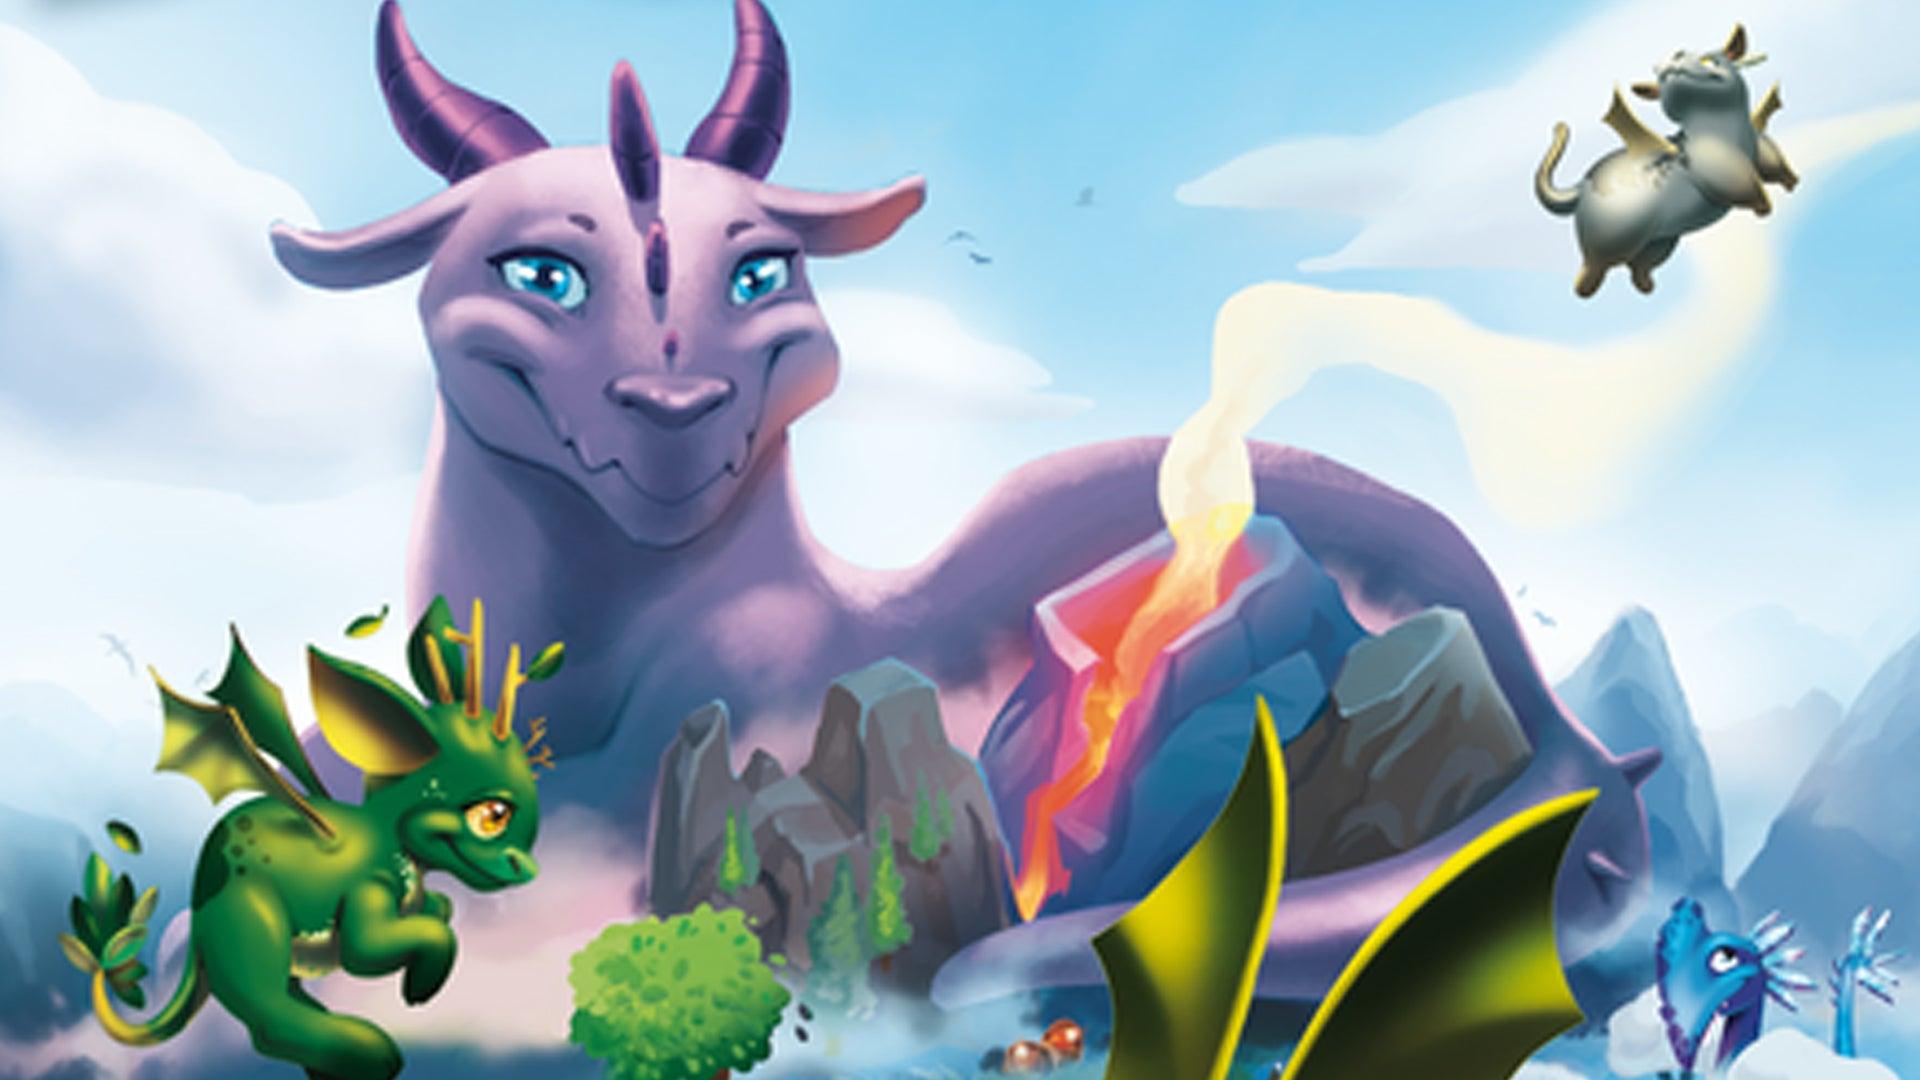 Dragomino board game artwork